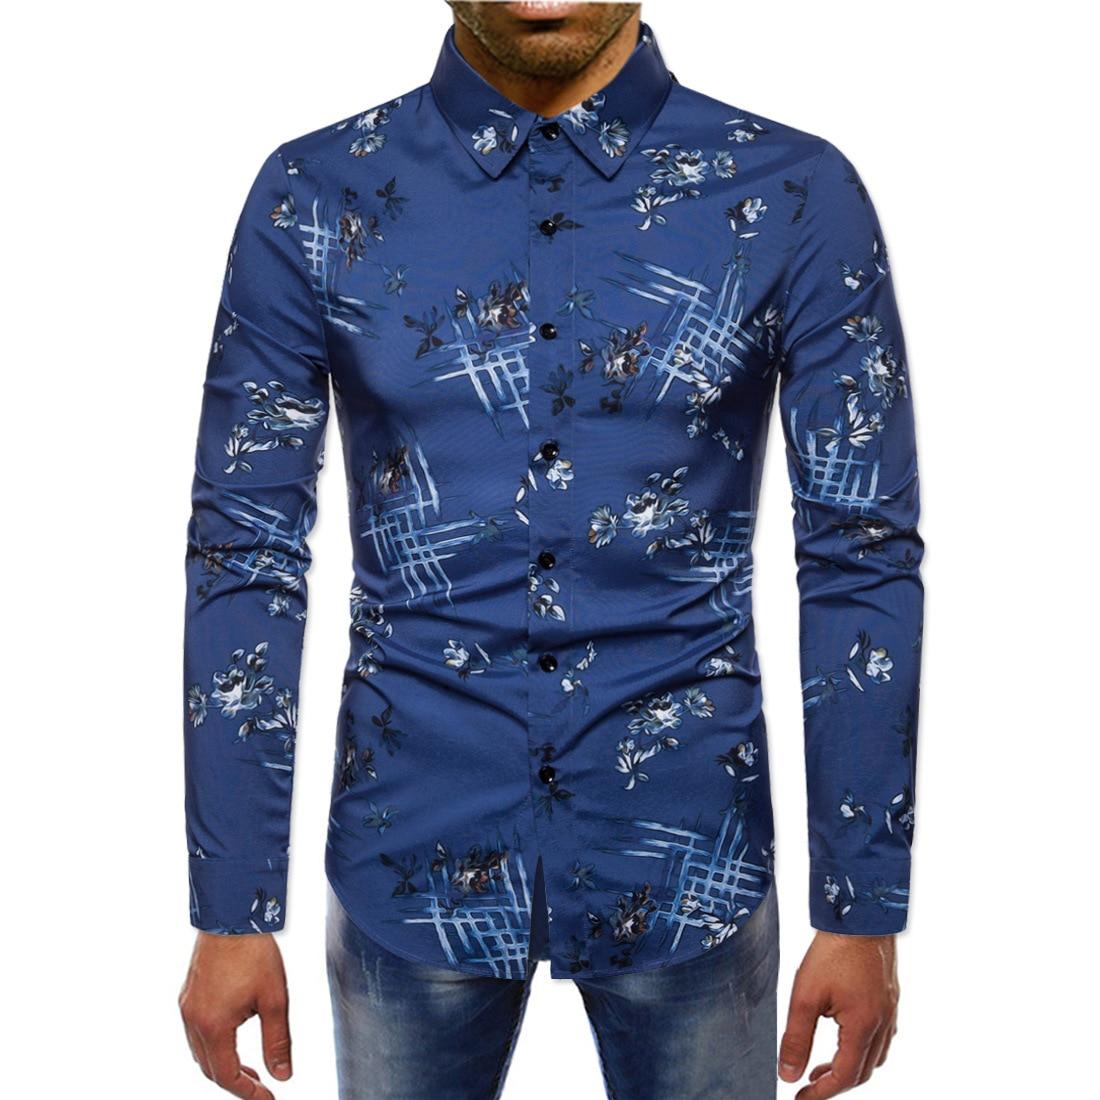 2019 New Style Autumn Casual Shirt MEN'S Cardigan Shirt Youth Casual Fold-down Collar Shirt Jj-ys062